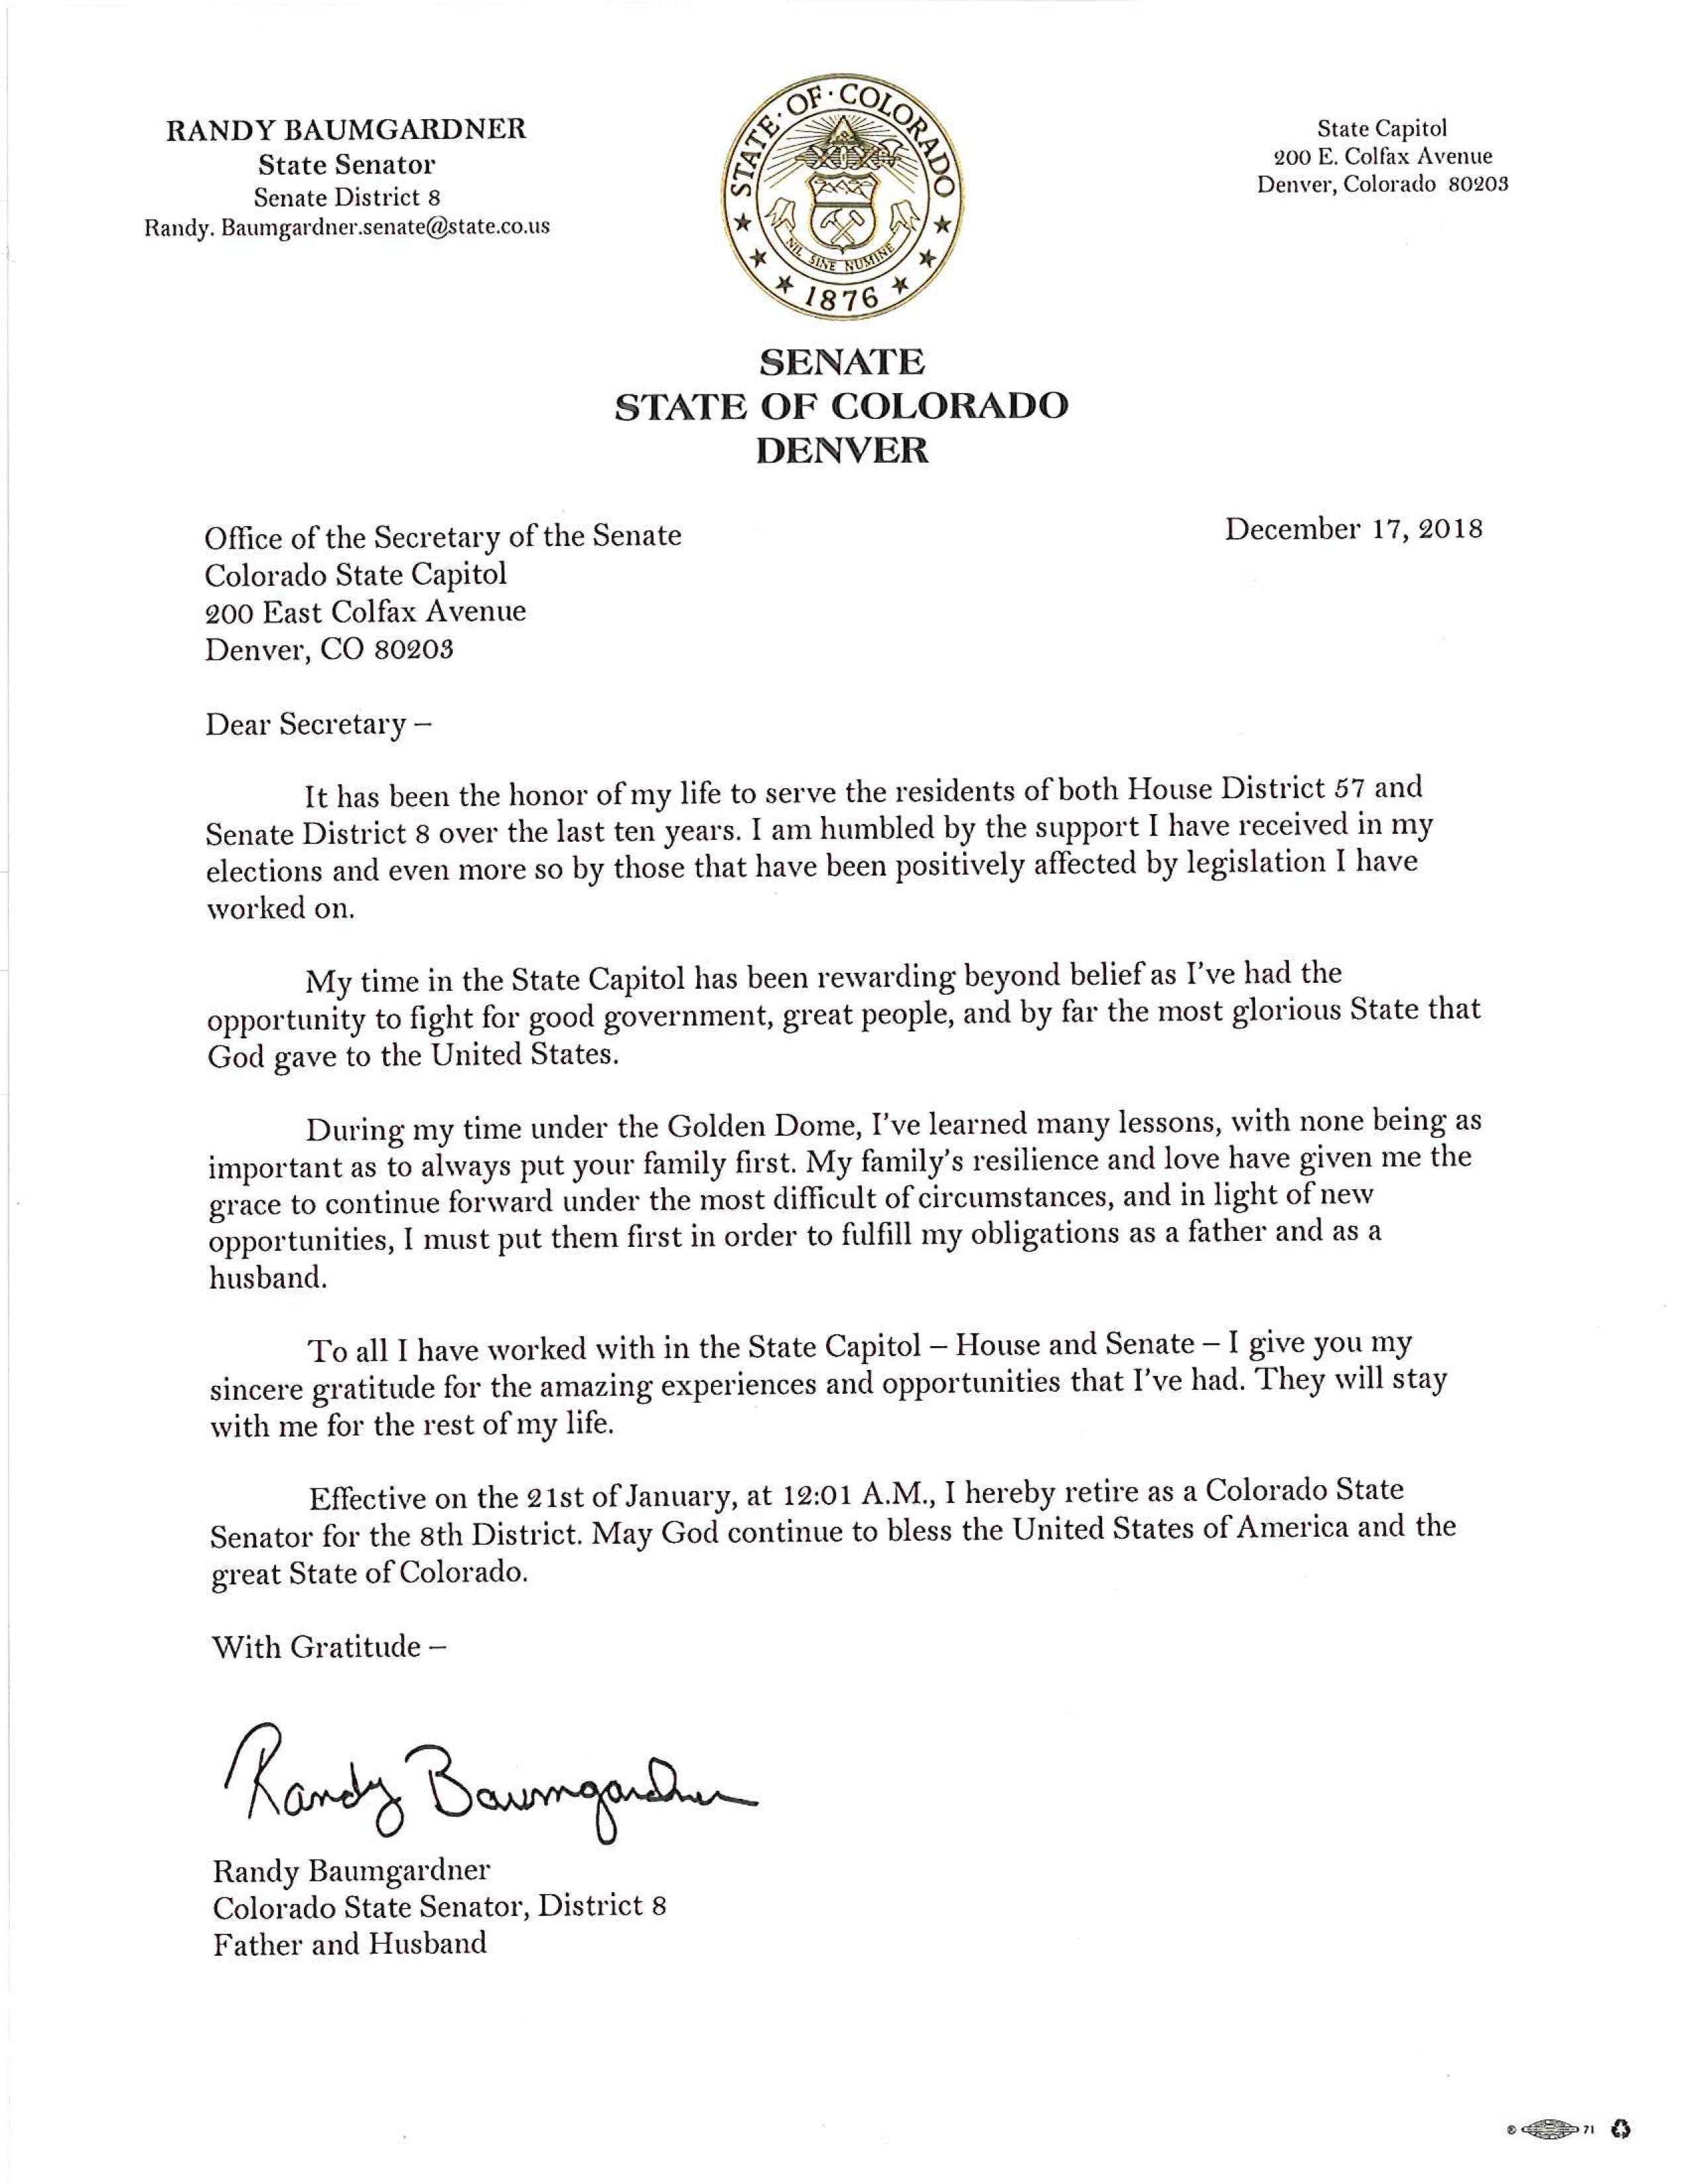 baumgardner resignation letter